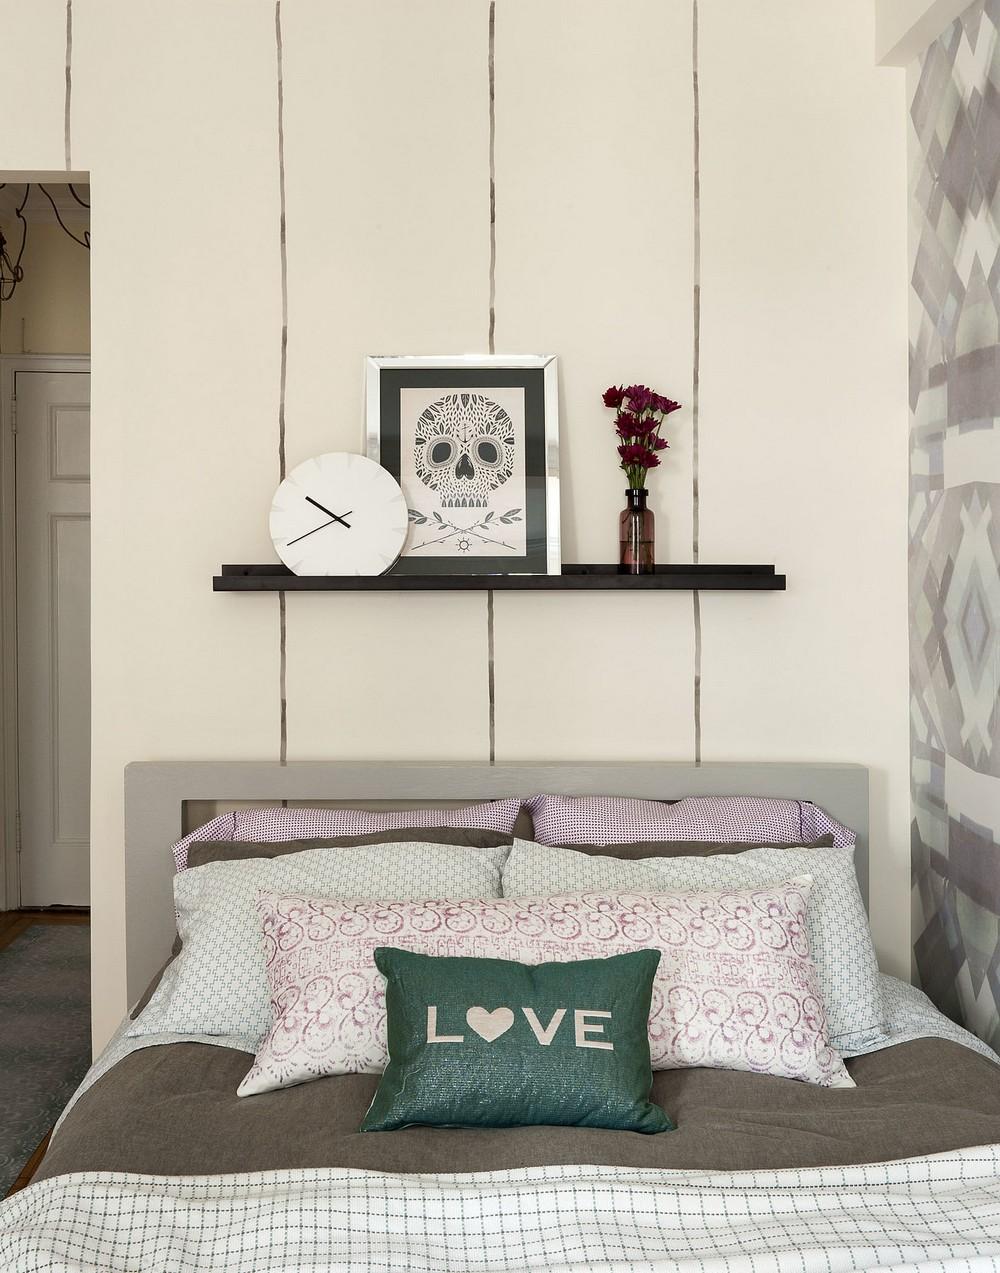 Интерьер квартиры-студии - полка над кроватью